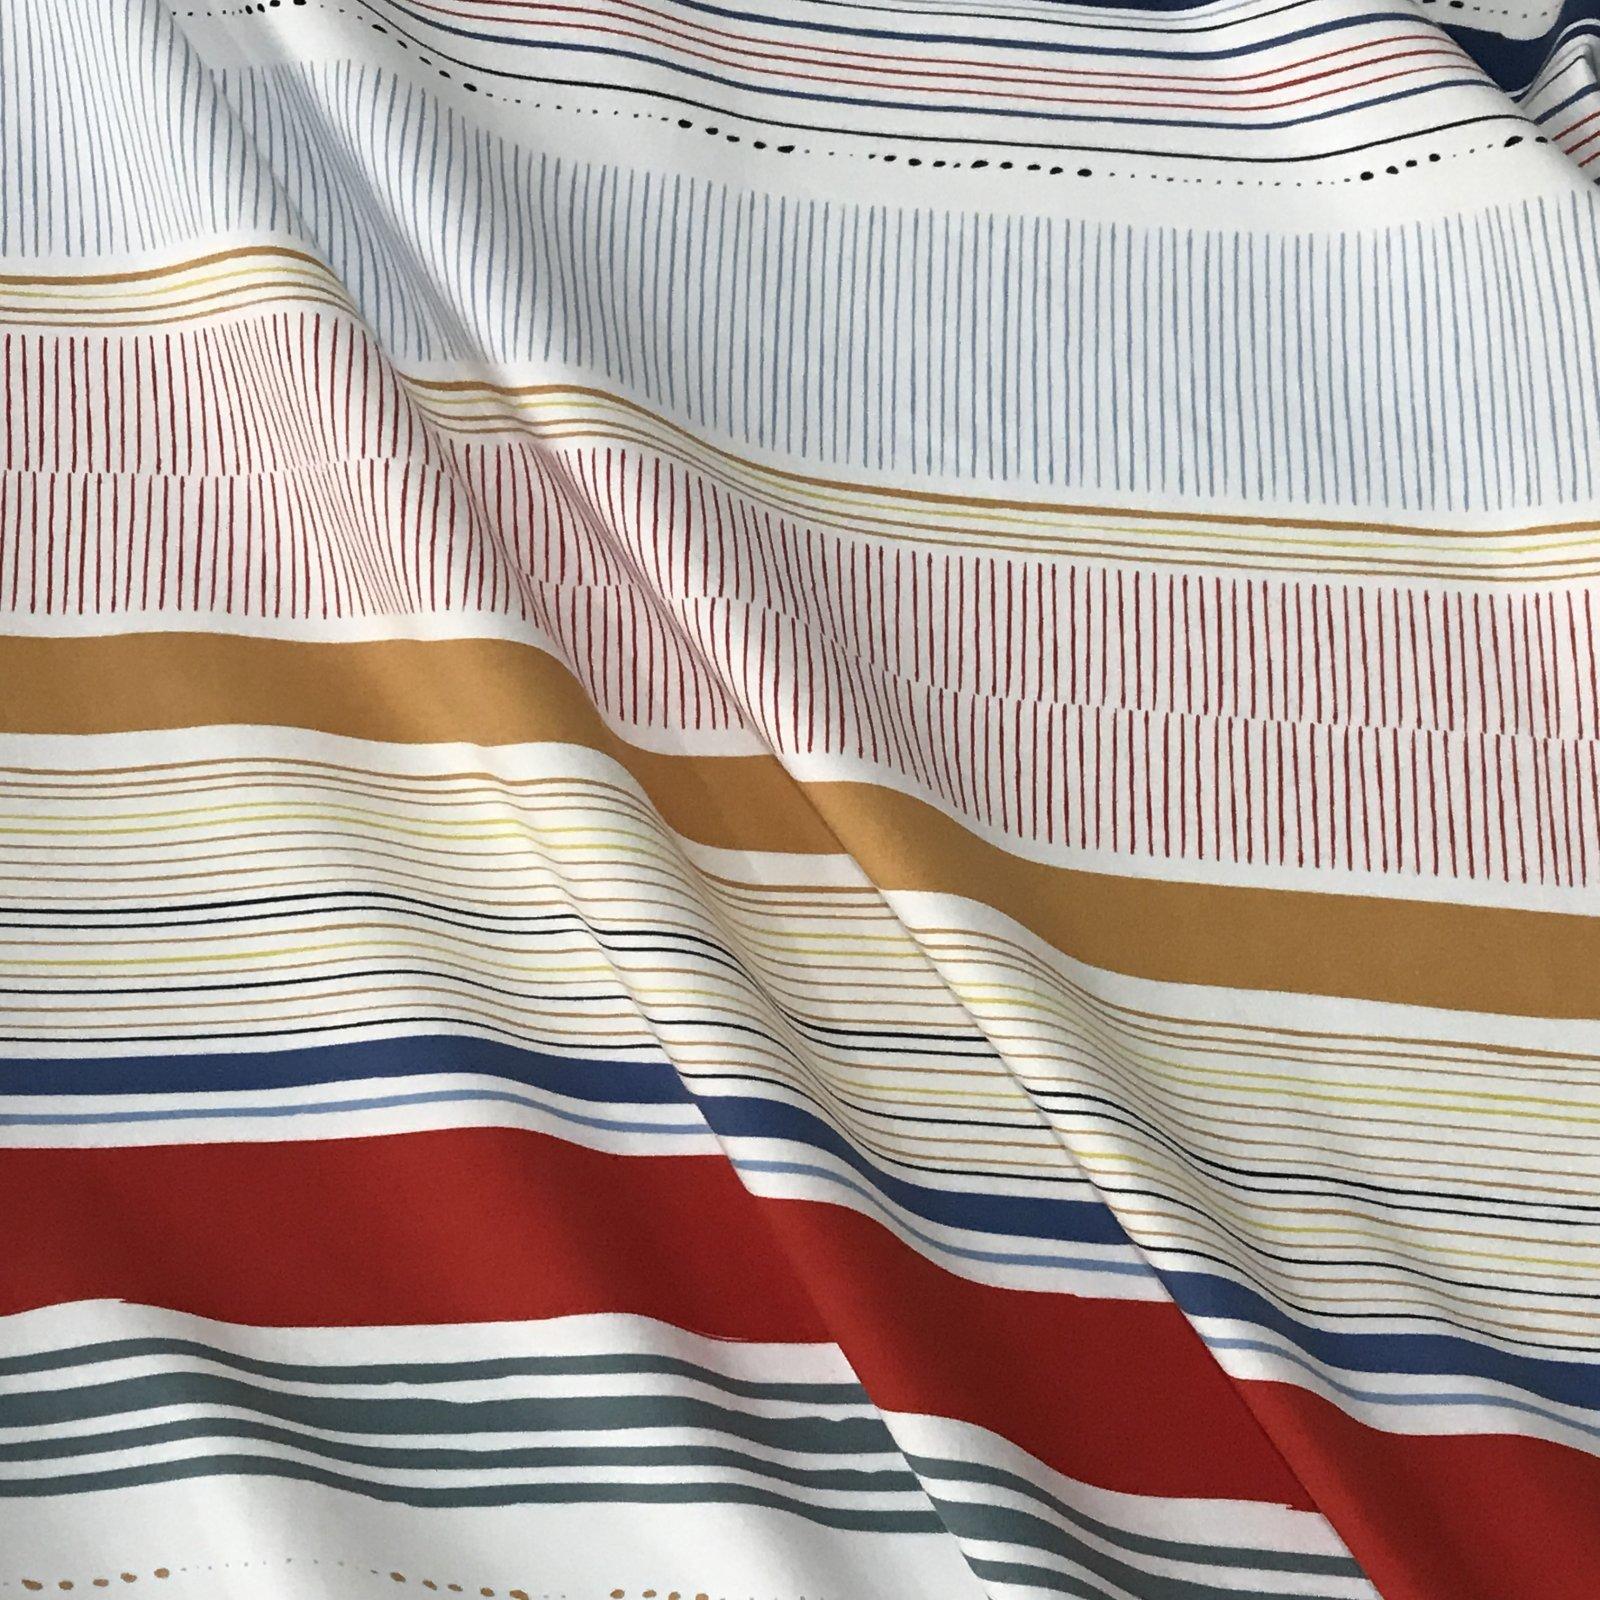 Cotton Knit - Line Study